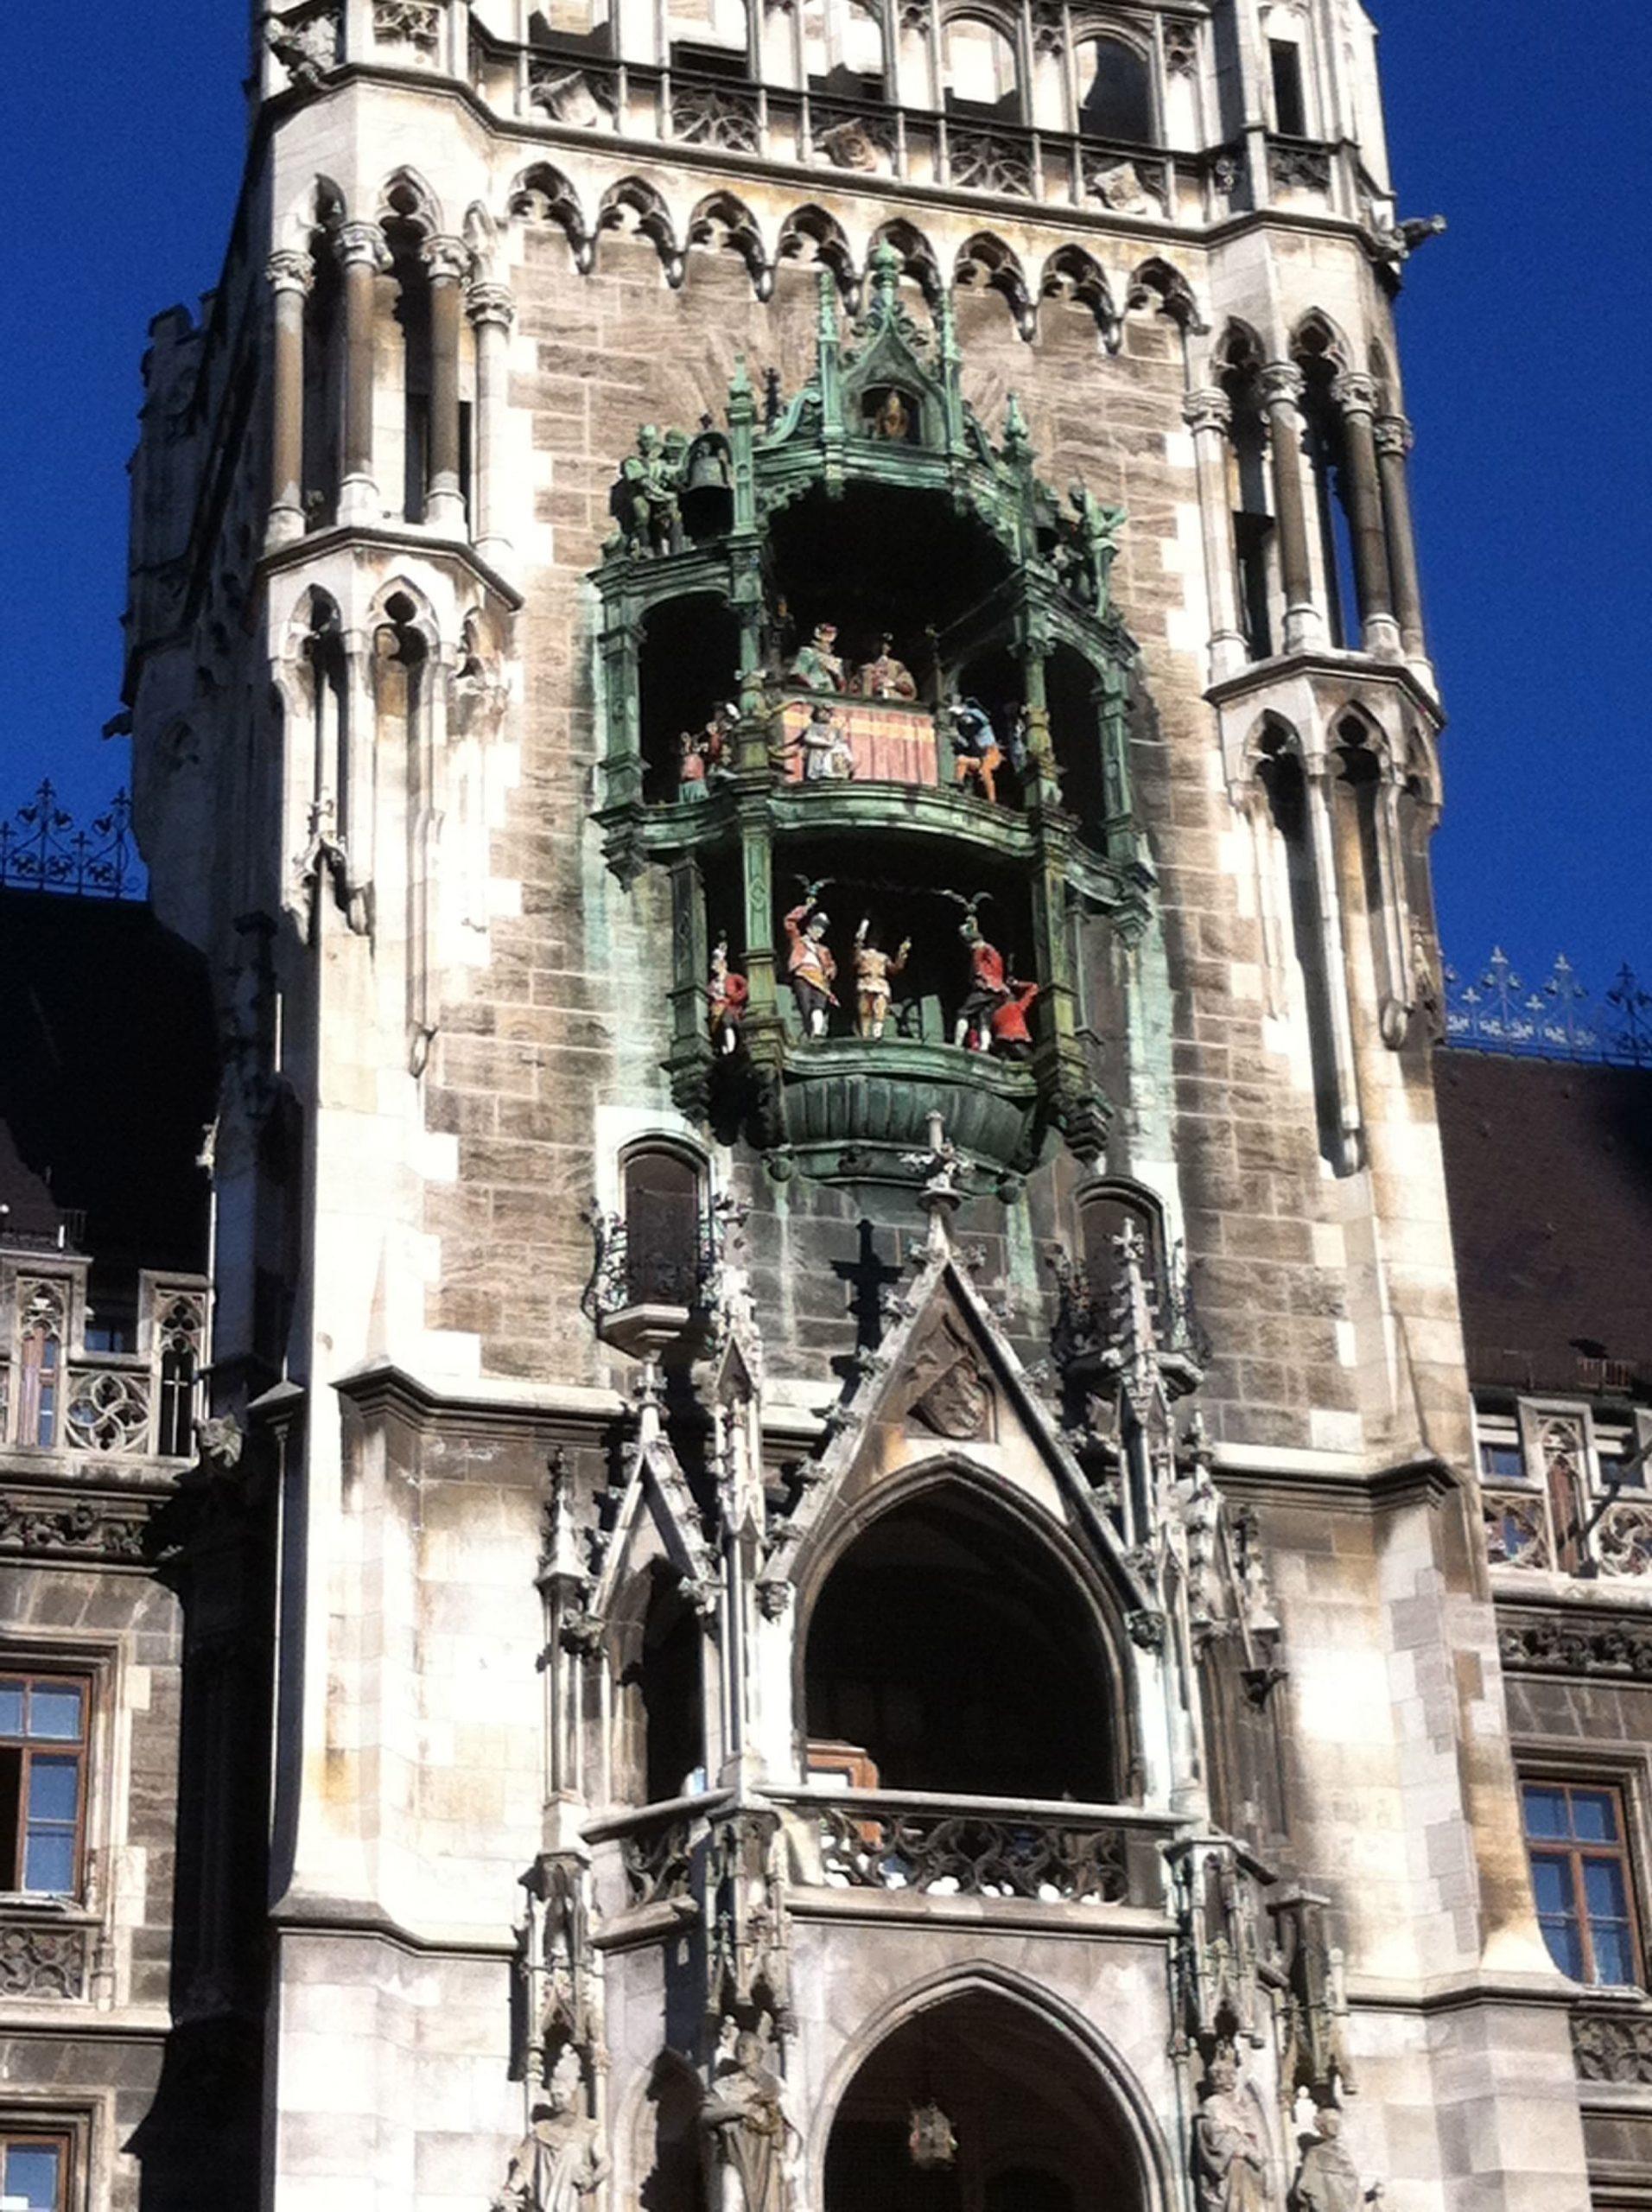 Detalle del Carrillón catedral Múnich